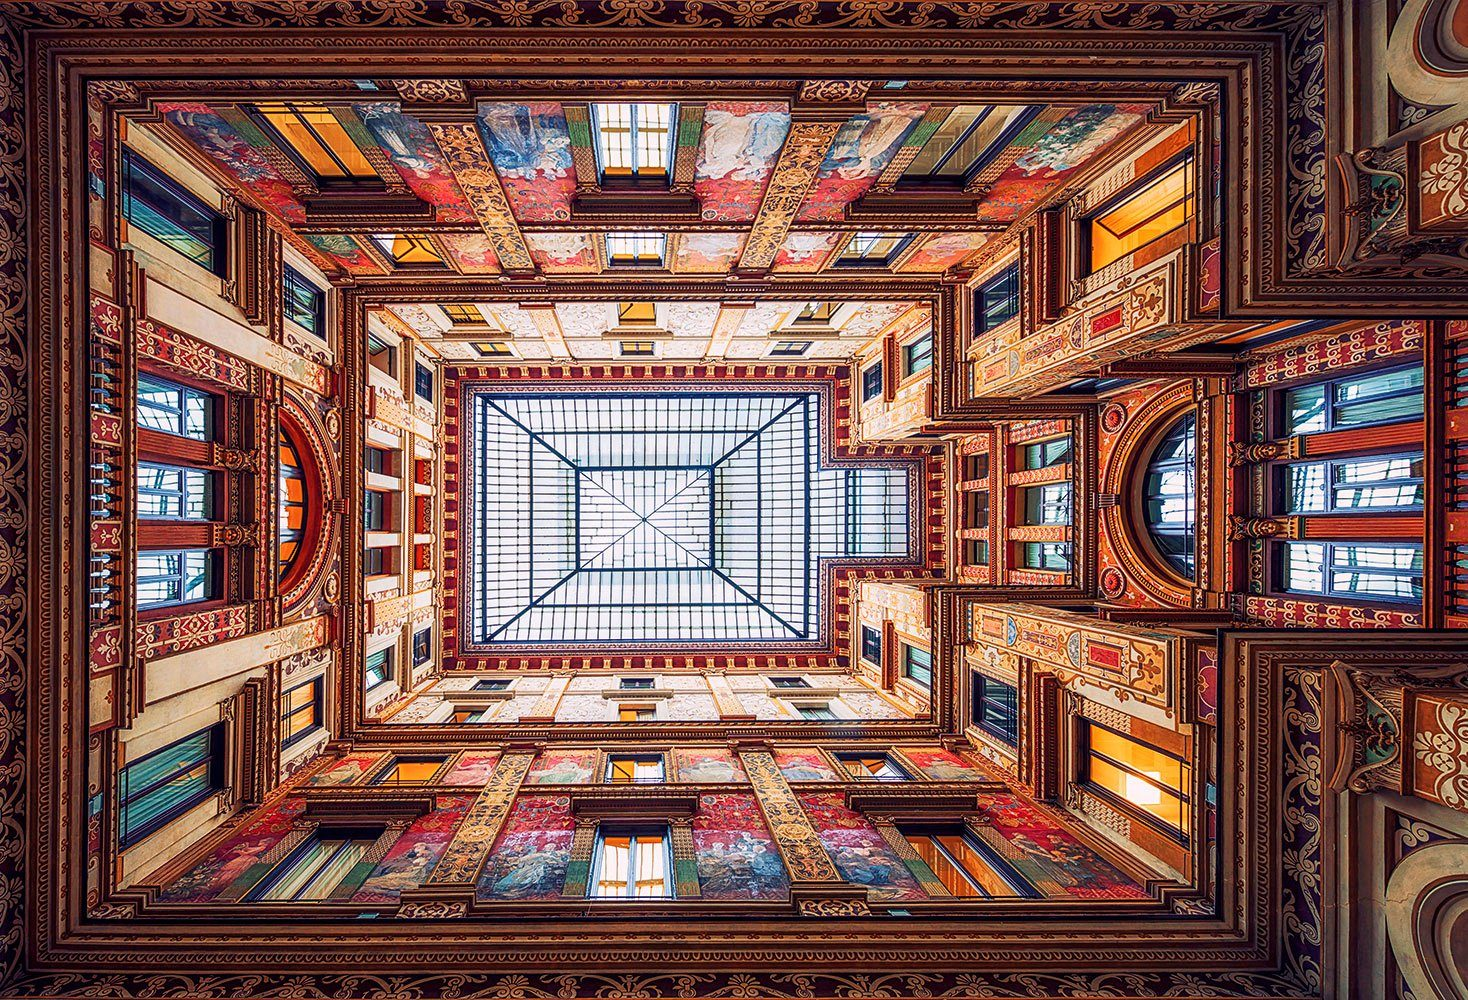 IDEALDECOR Fototapete »Galleria Sciarra Rome«